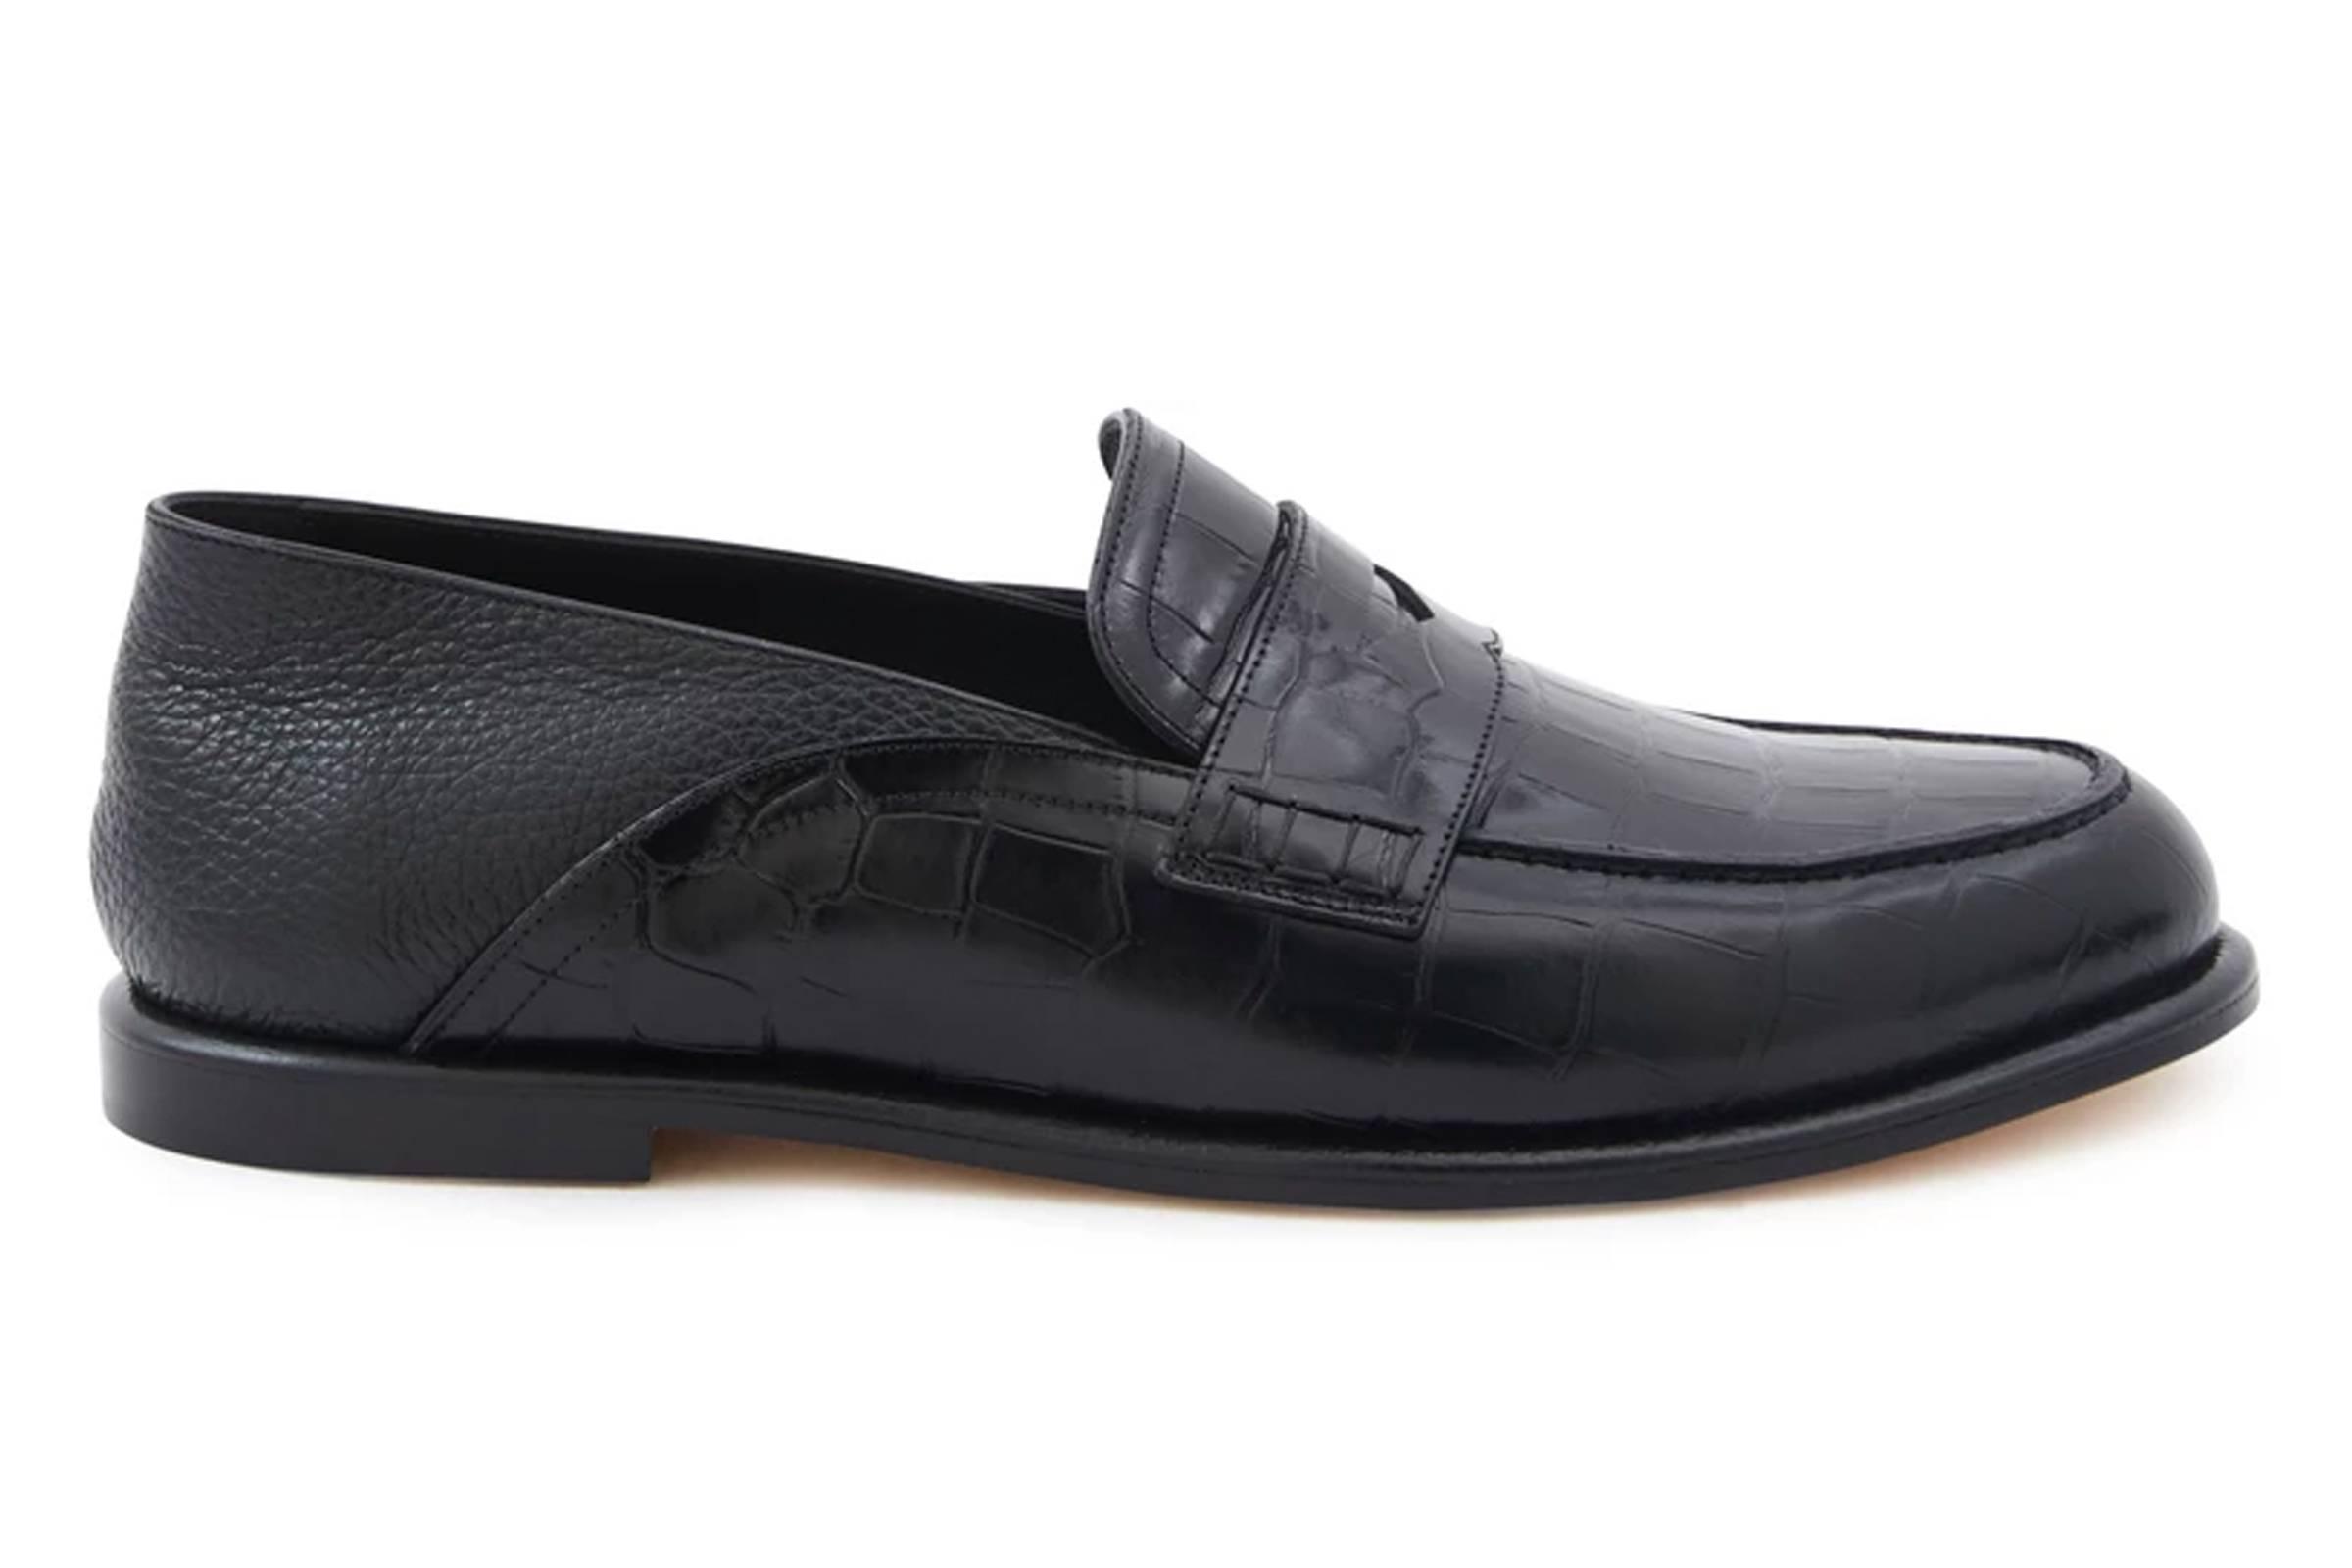 Loewe Collapsible Heel Loafer